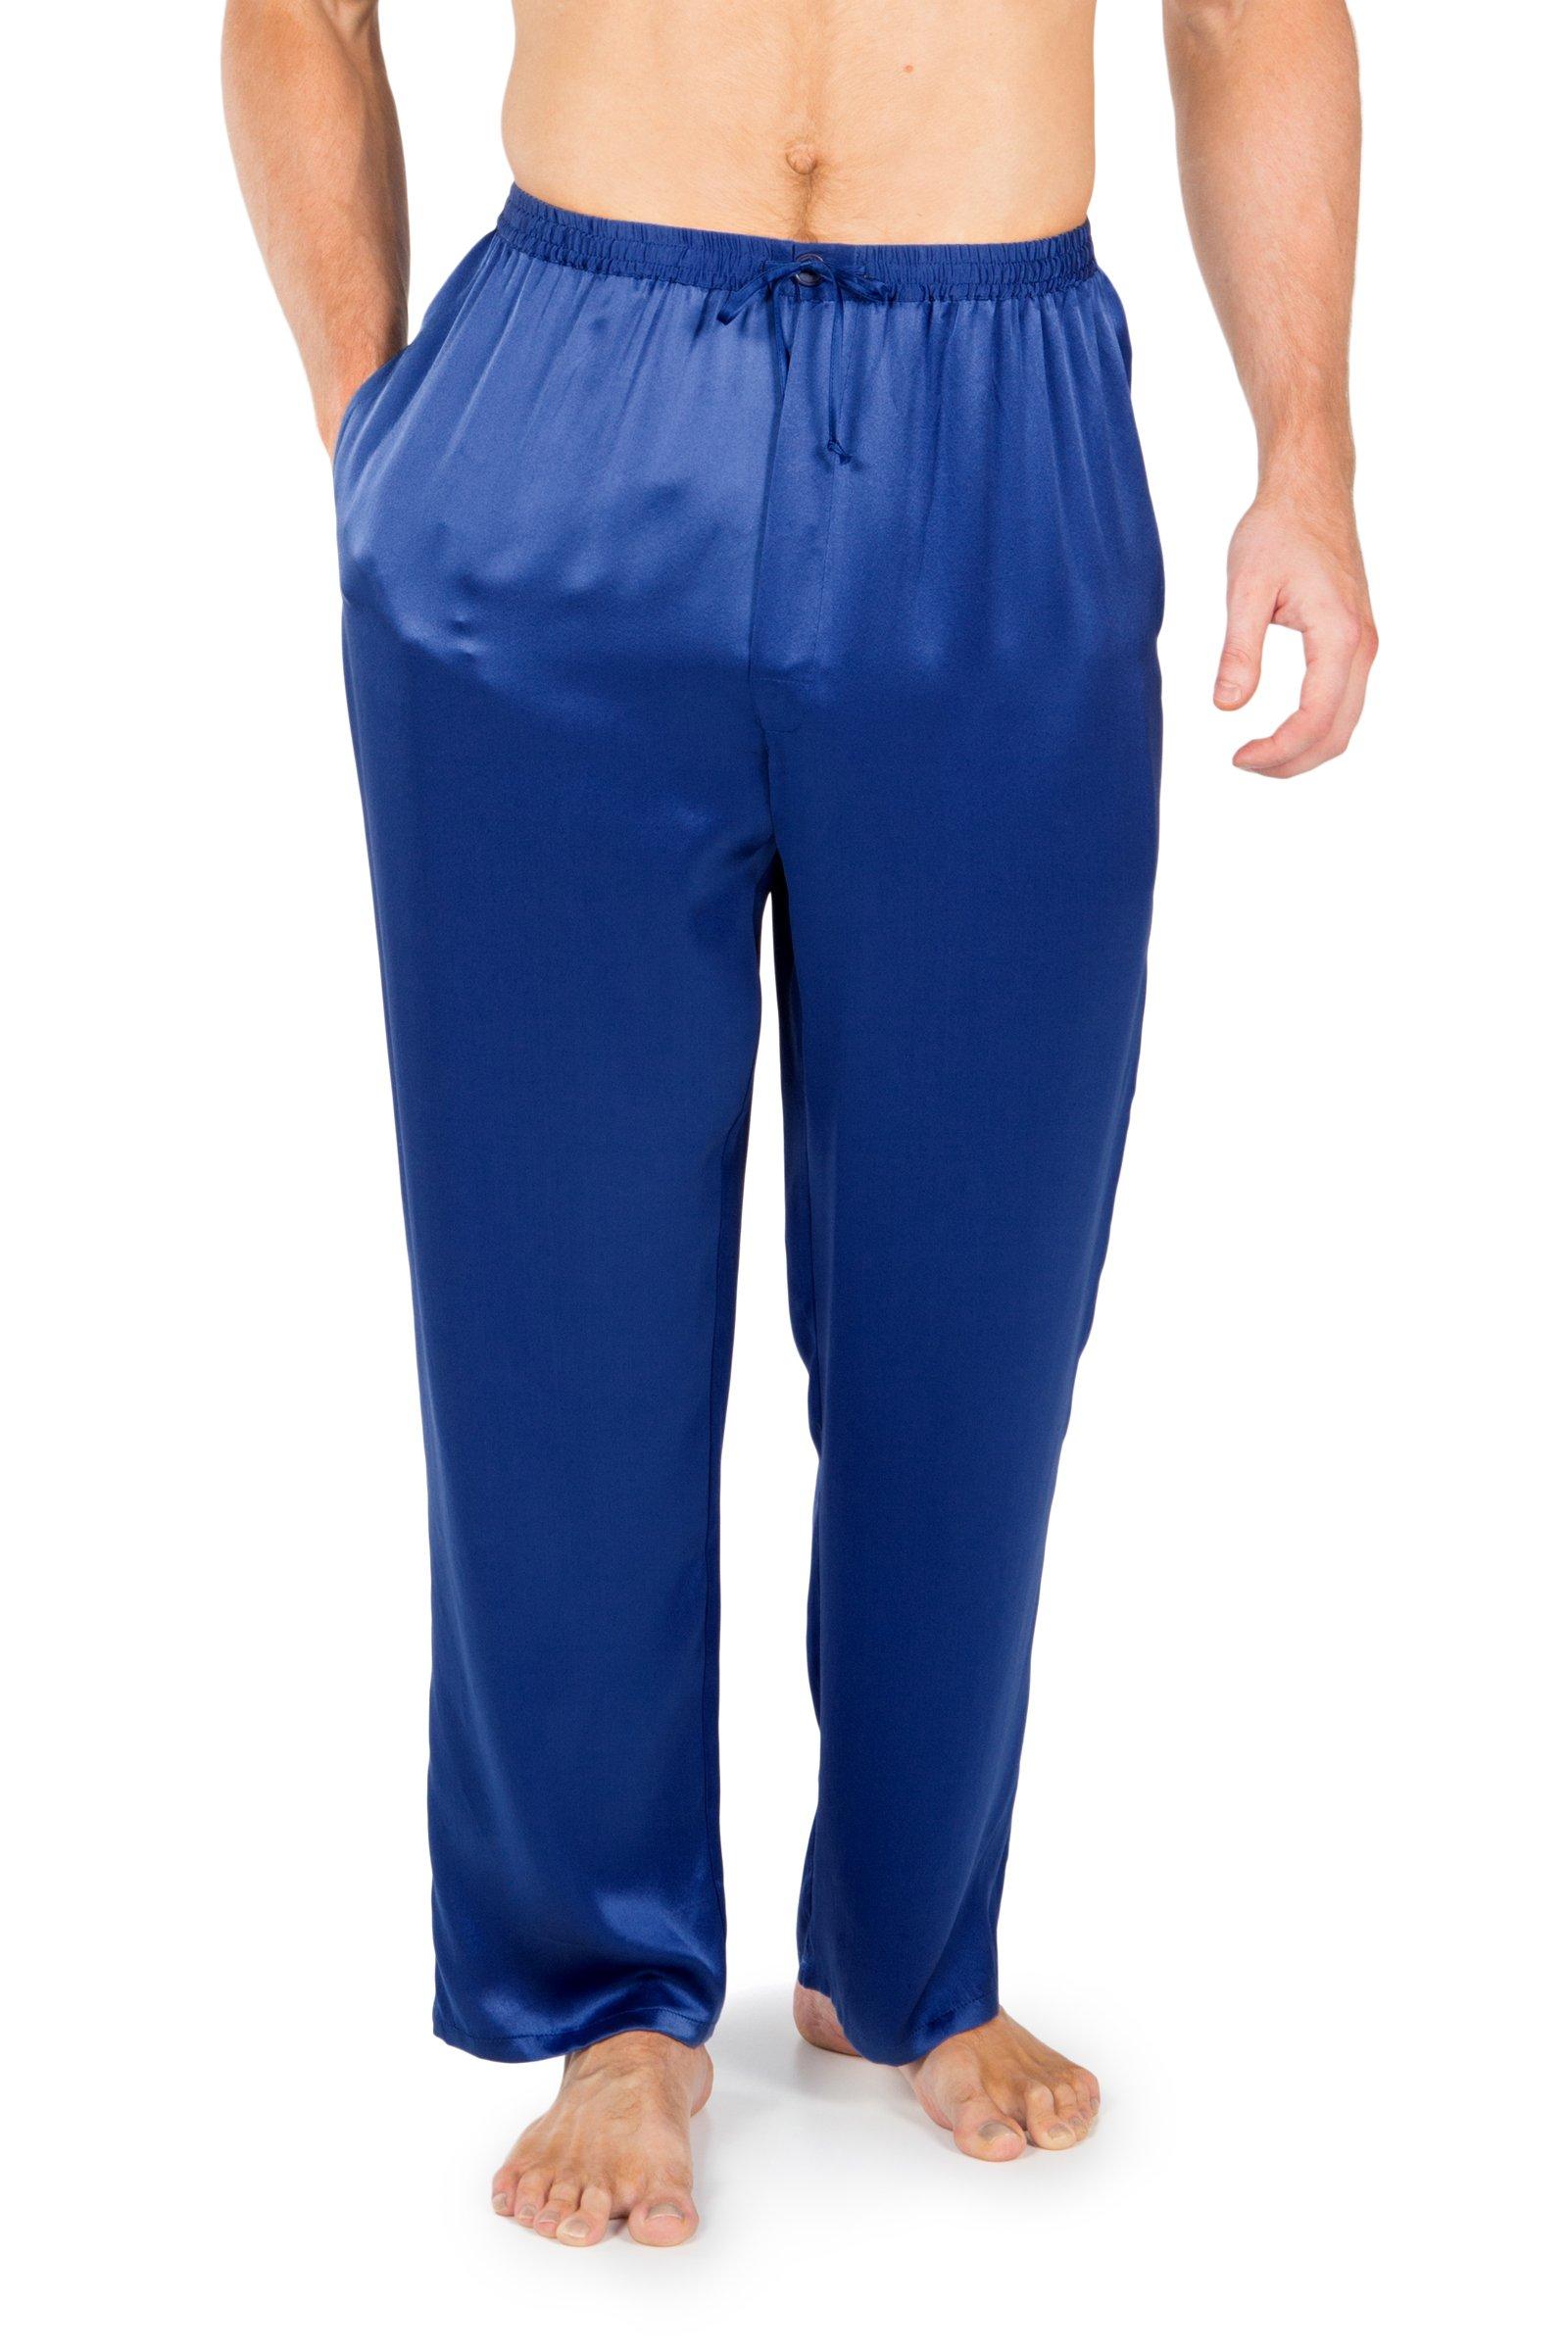 TexereSilk Men's Luxury Silk Pajama Pants (Hiruko, Royal Blue, Large) Unique Gifts For Men's Birthday MS0201-RYB-L